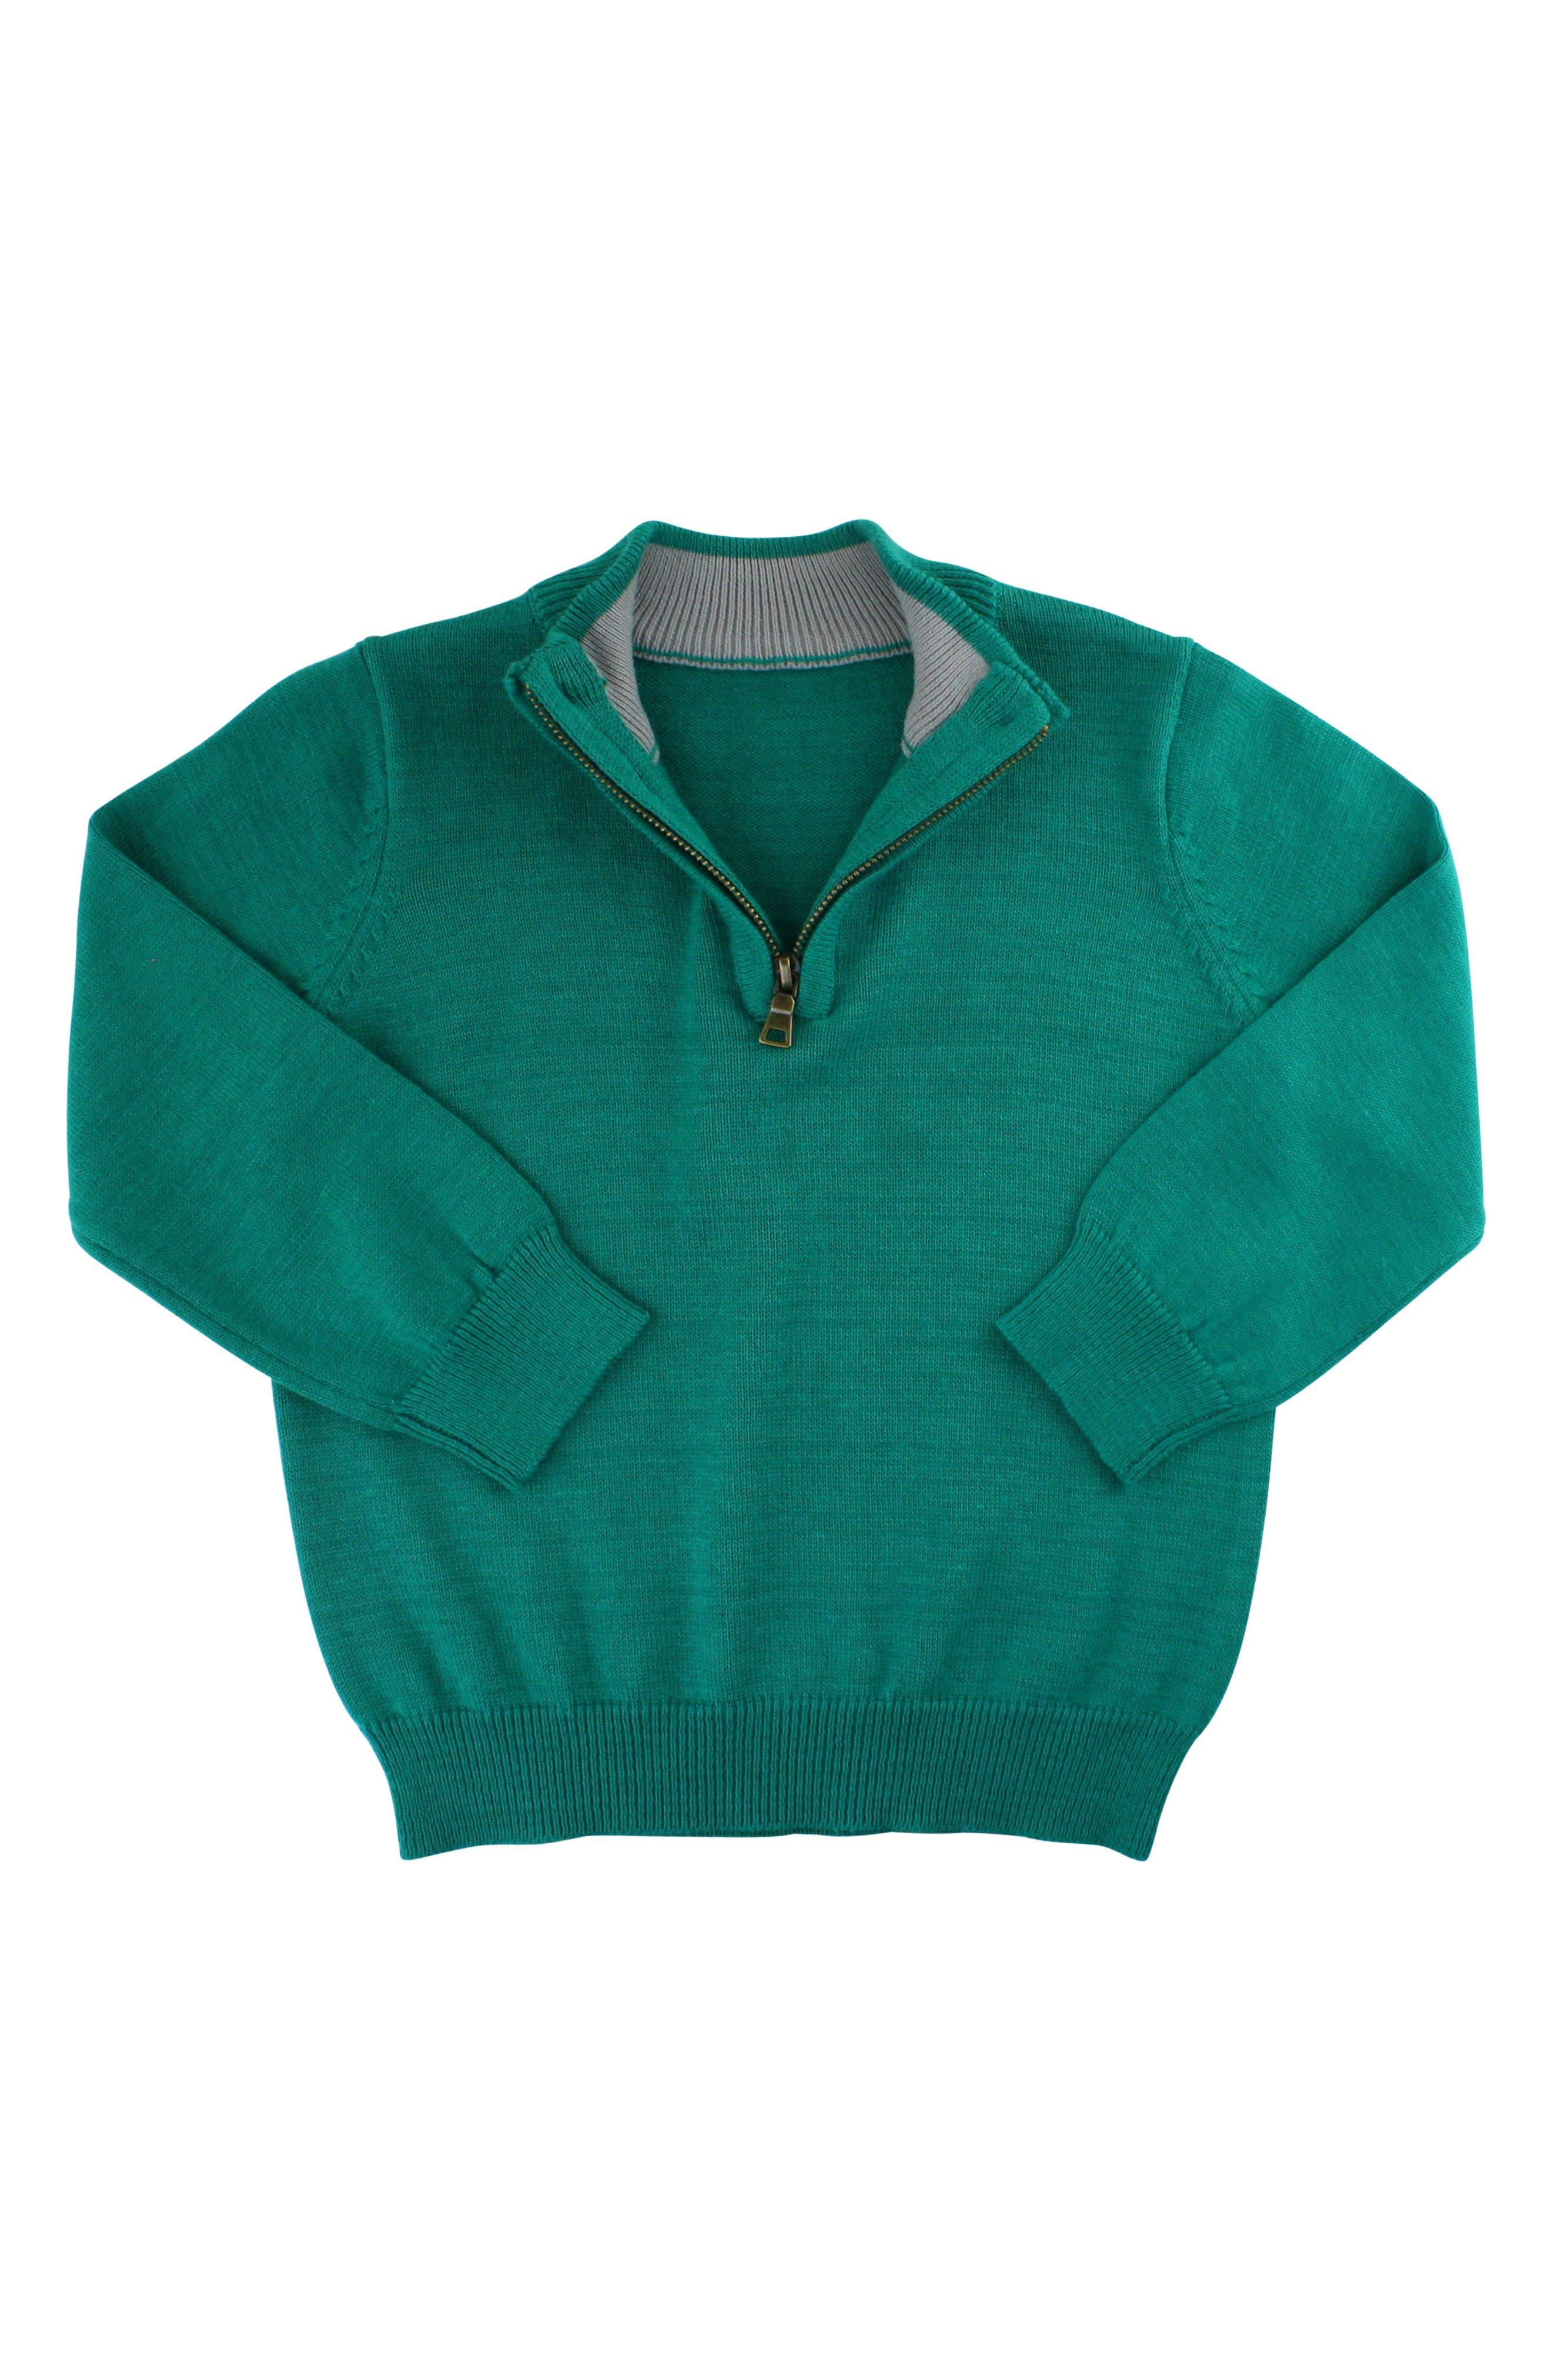 RUGGEDBUTTS, Gingham Shirt & Pullover Sweater Set, Alternate thumbnail 4, color, 300